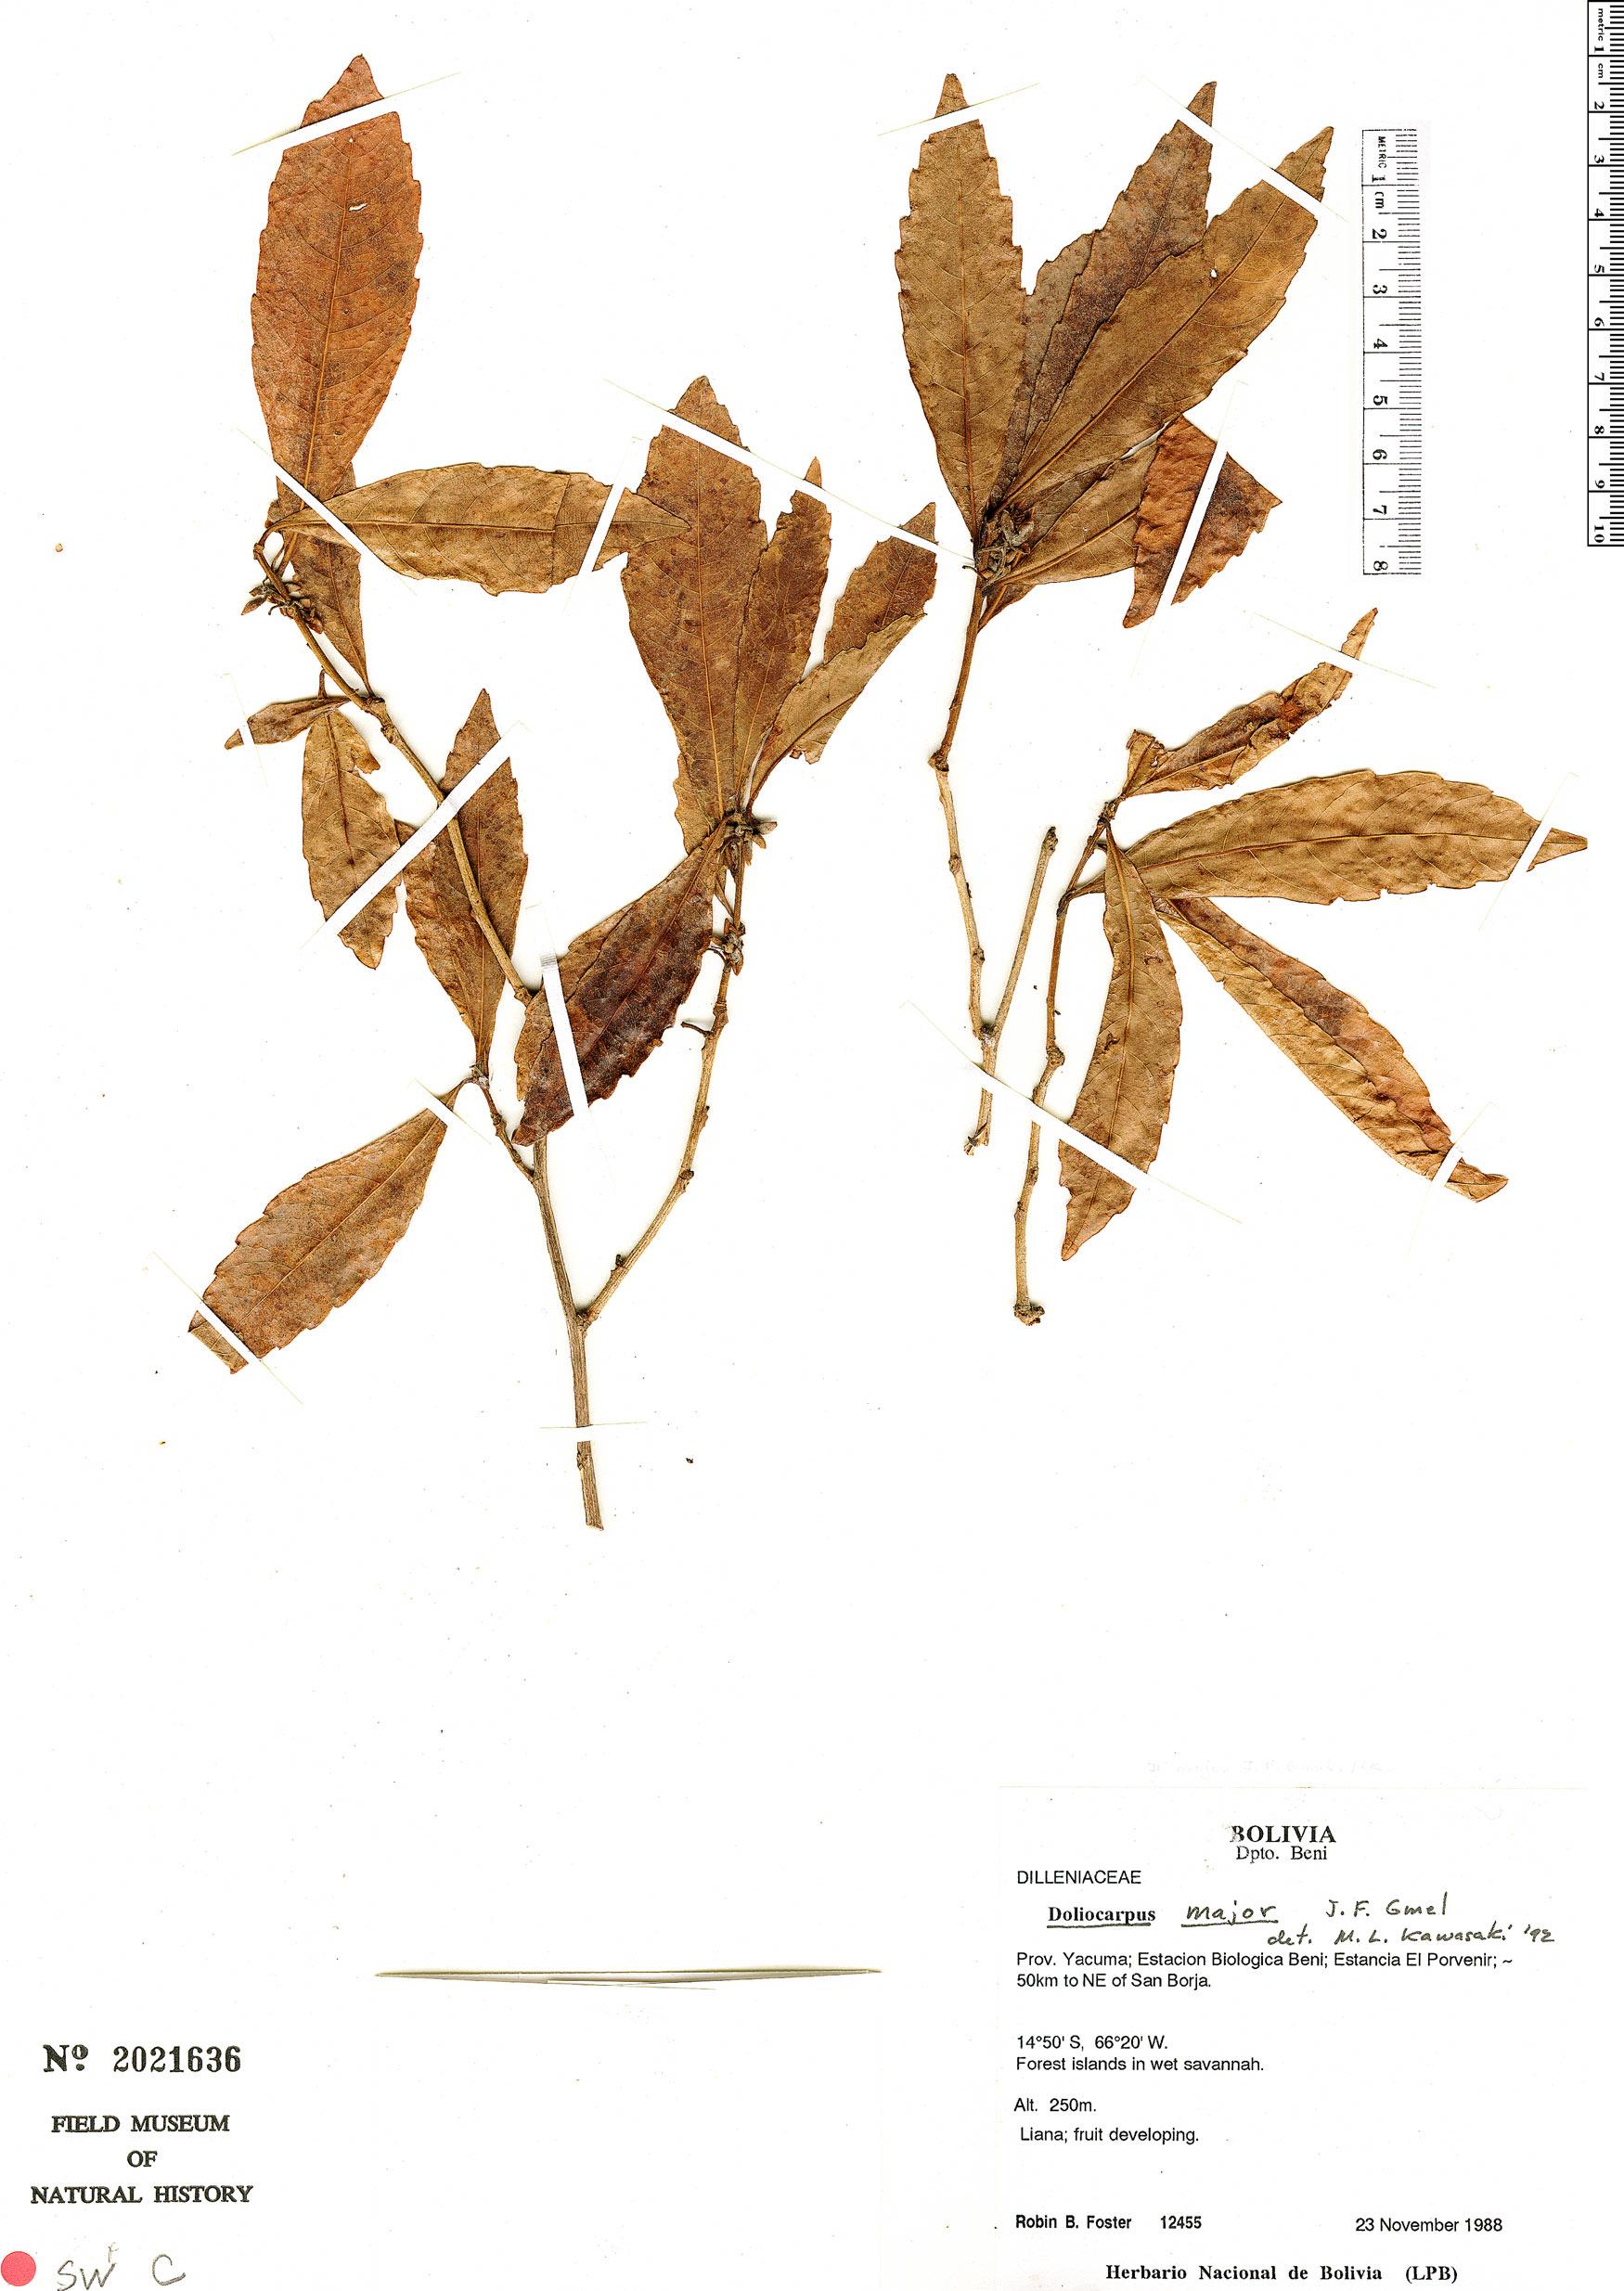 Specimen: Doliocarpus major